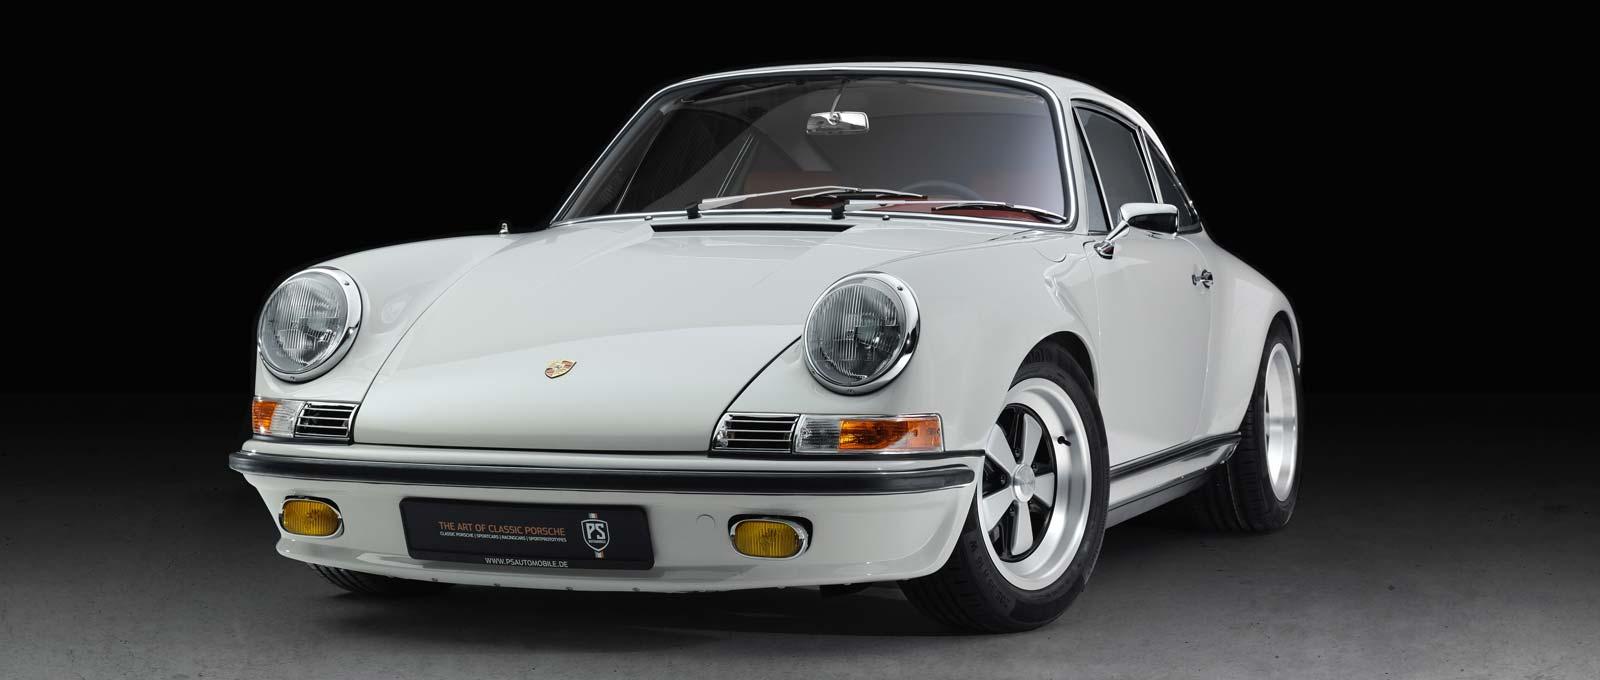 Porsche 911 ST Umbau – REIHERGRAU